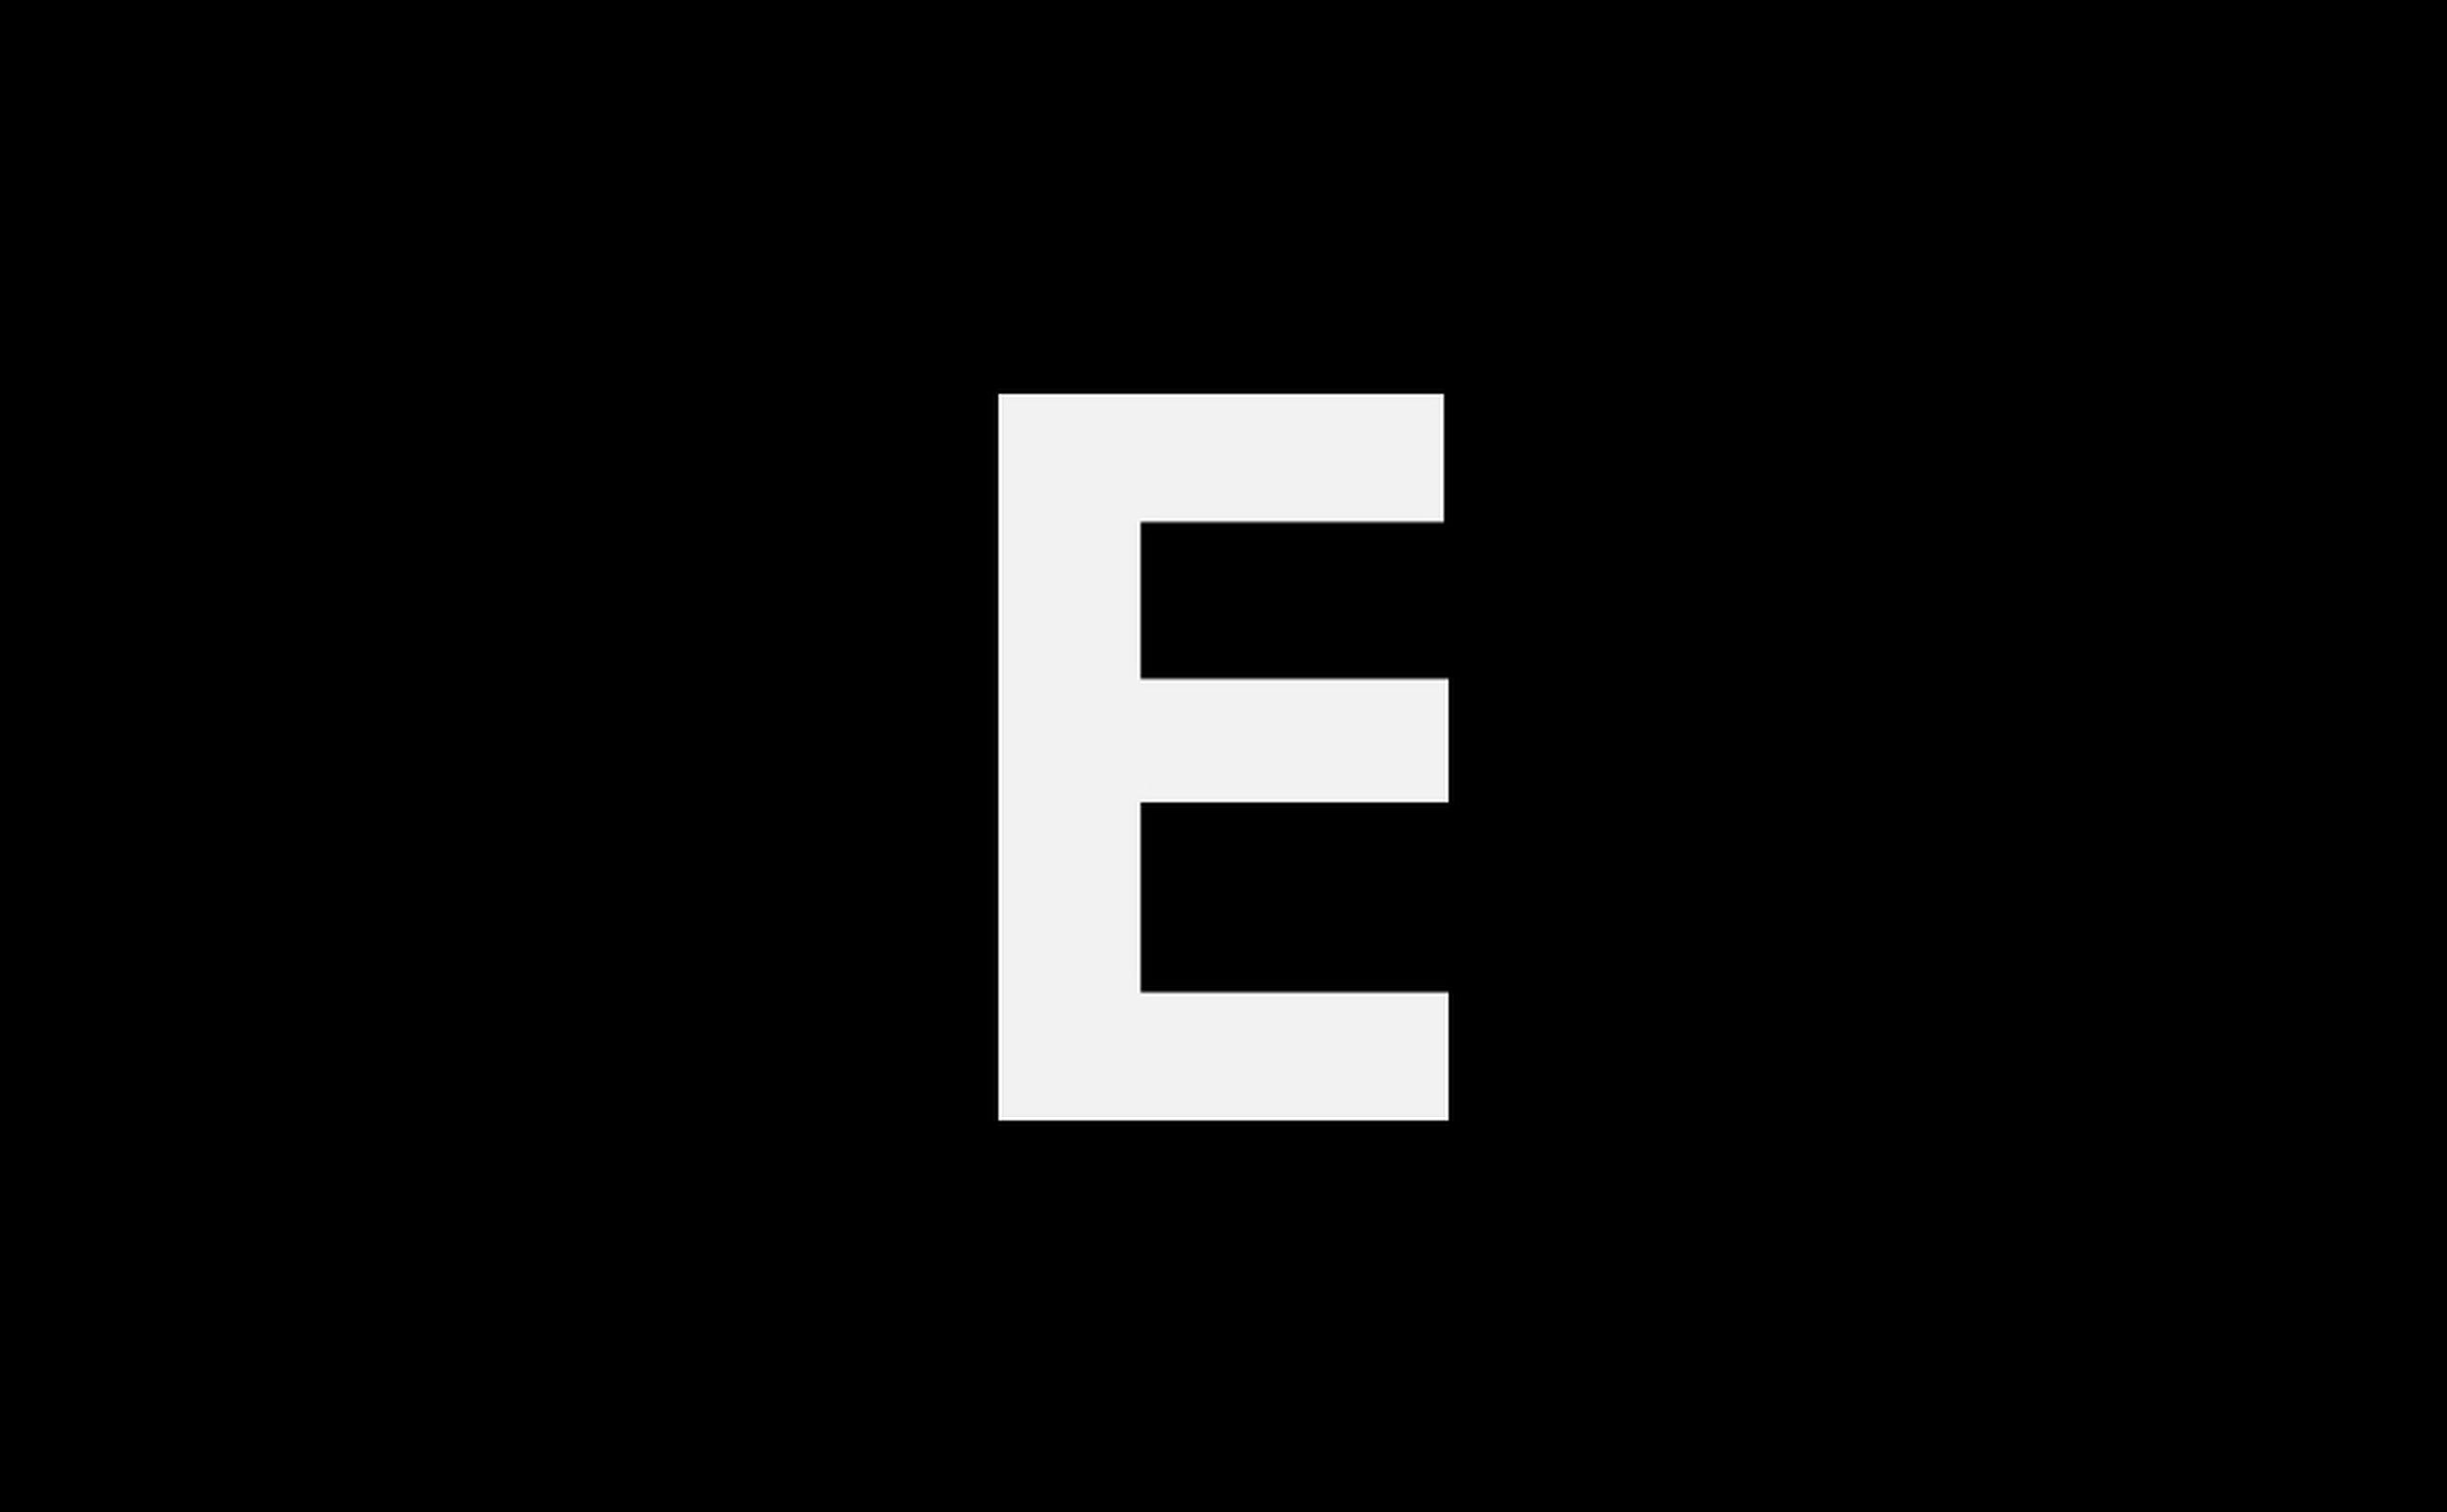 INFORMATION SIGN ON ILLUMINATED CITY STREET AT NIGHT